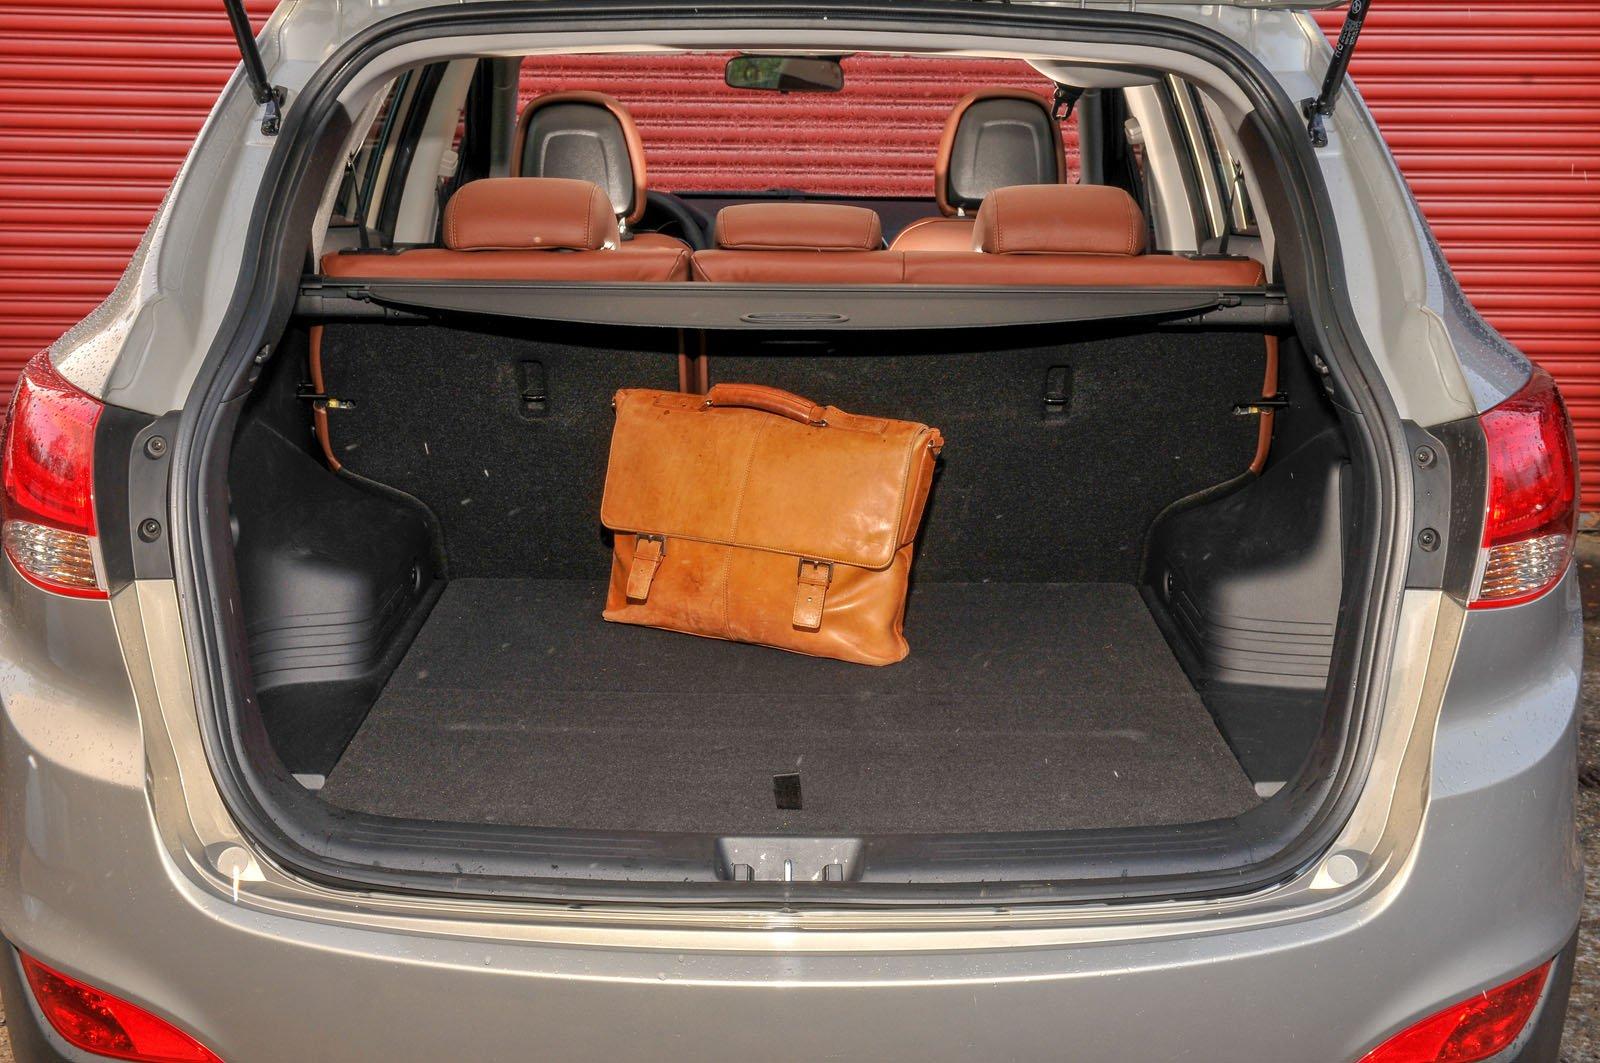 Used Hyundai ix35 2009-2015